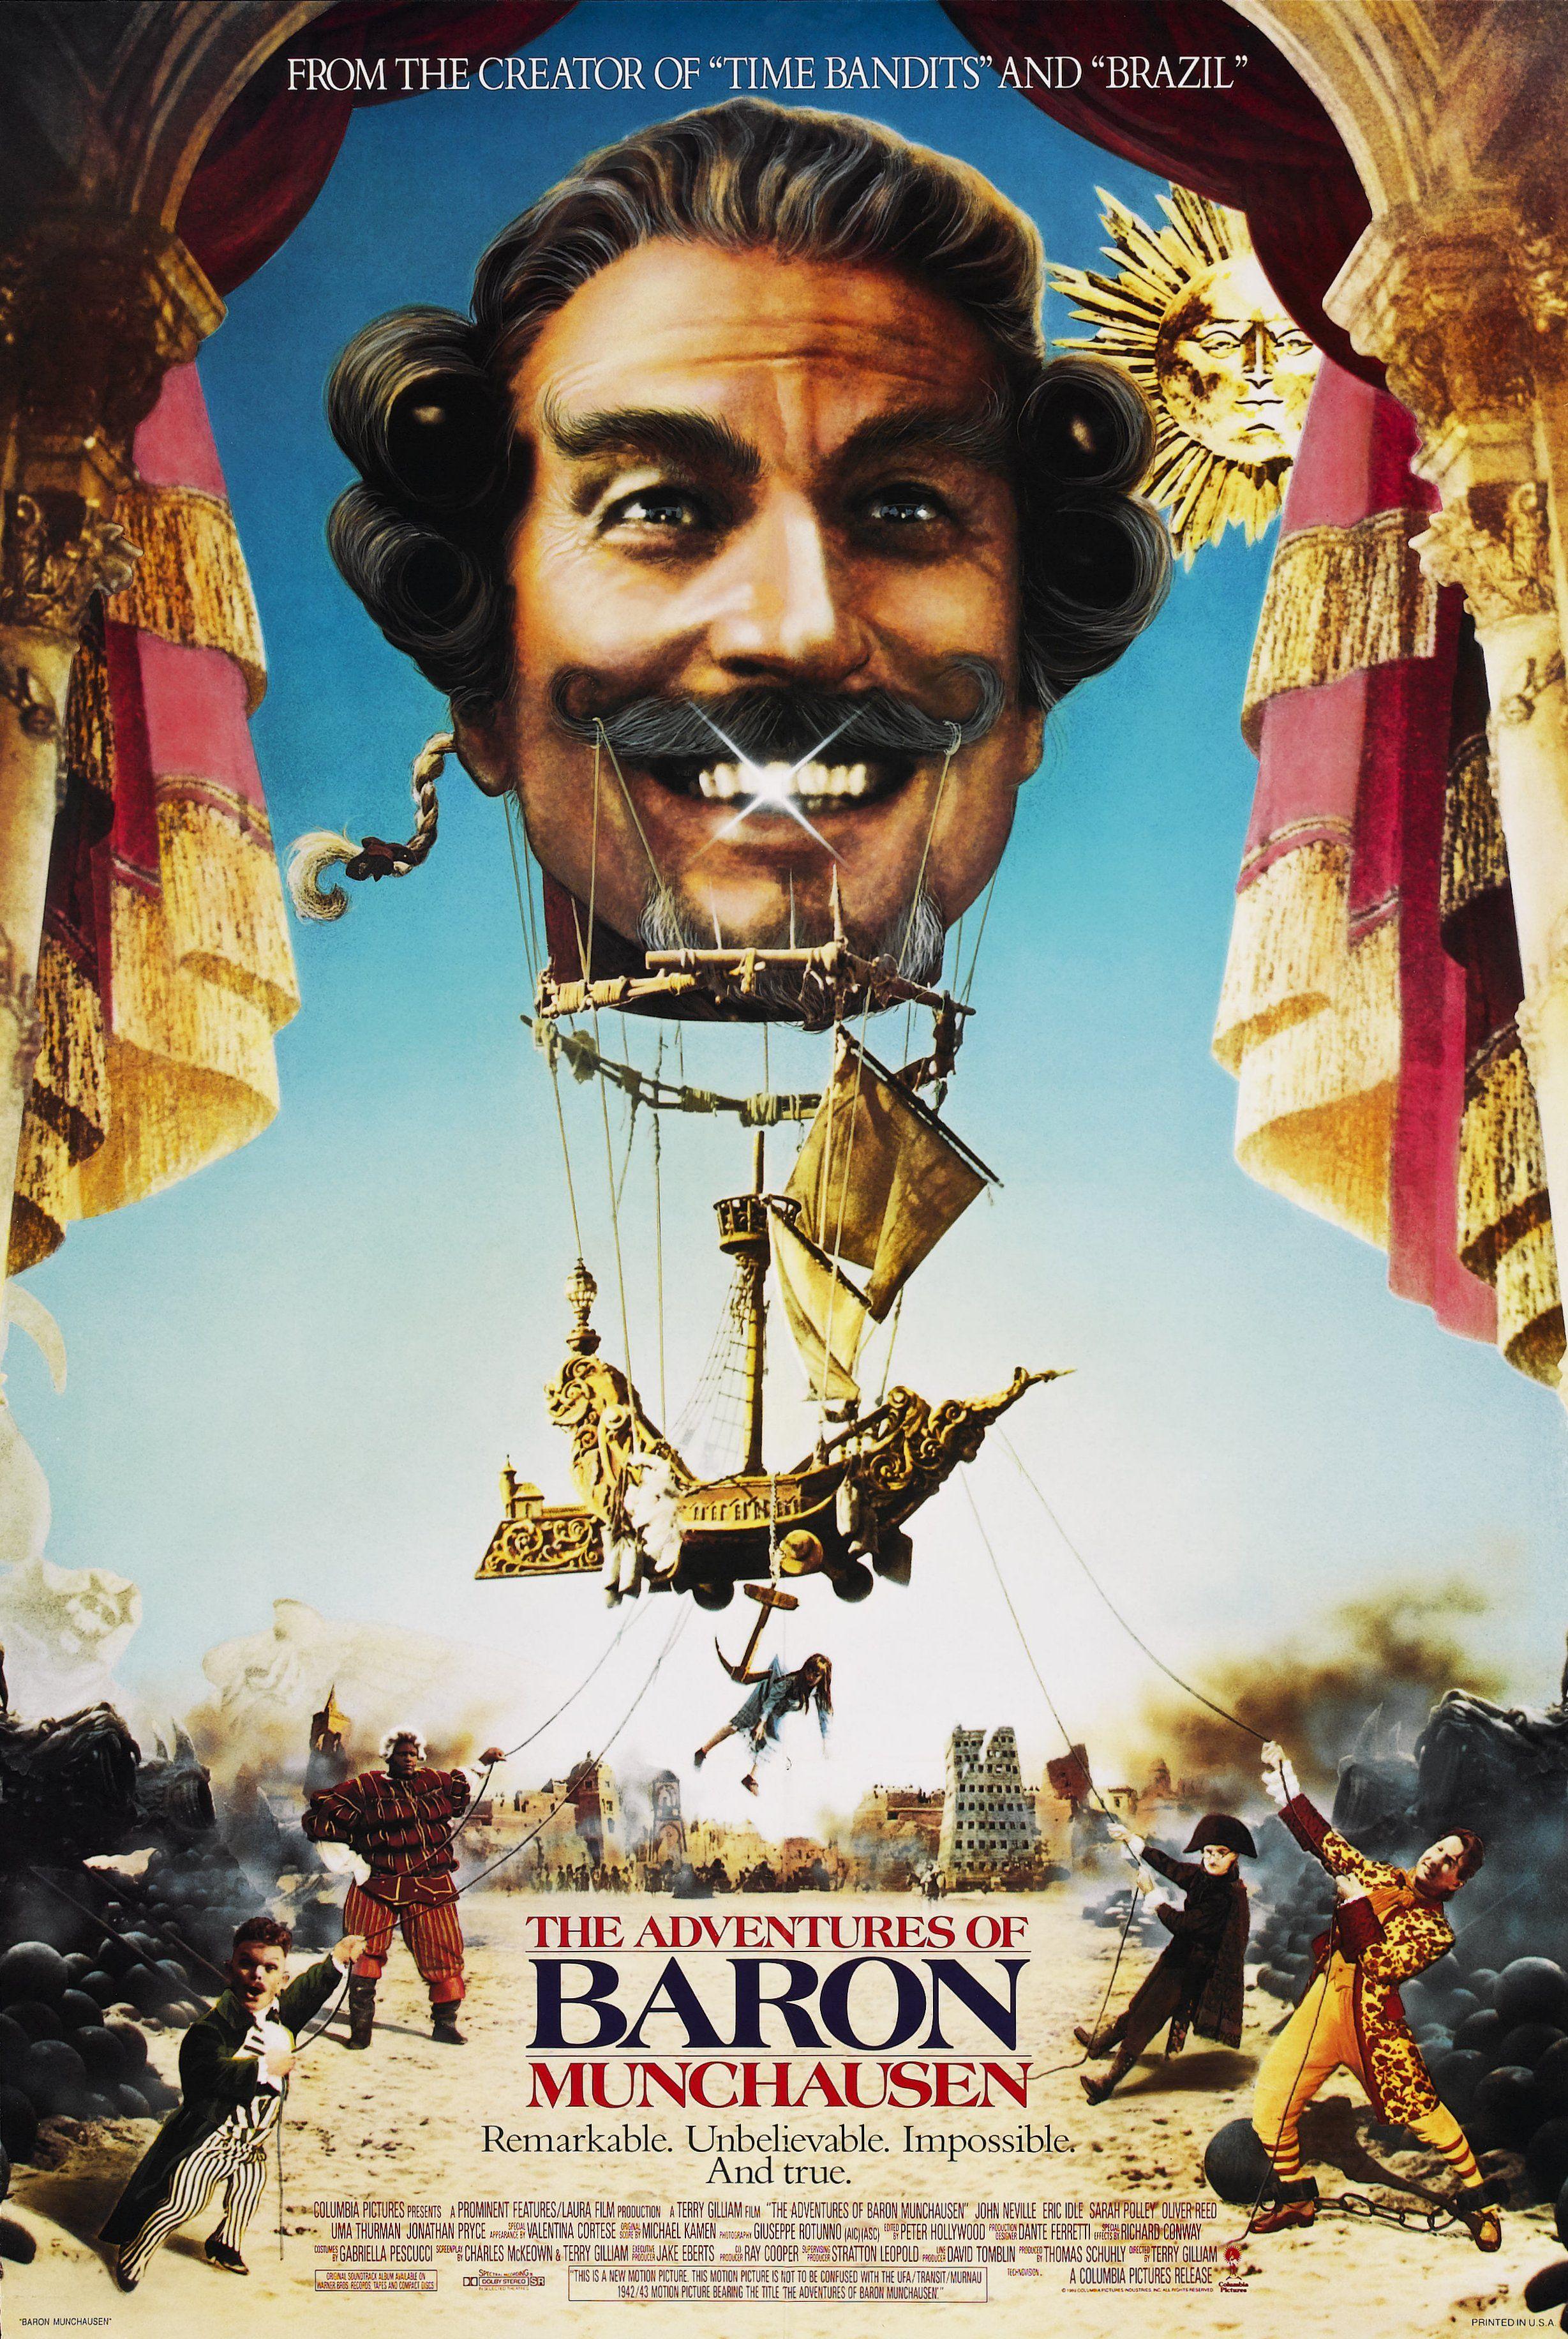 The Adventures of Baron Munchausen movie poster, 1988